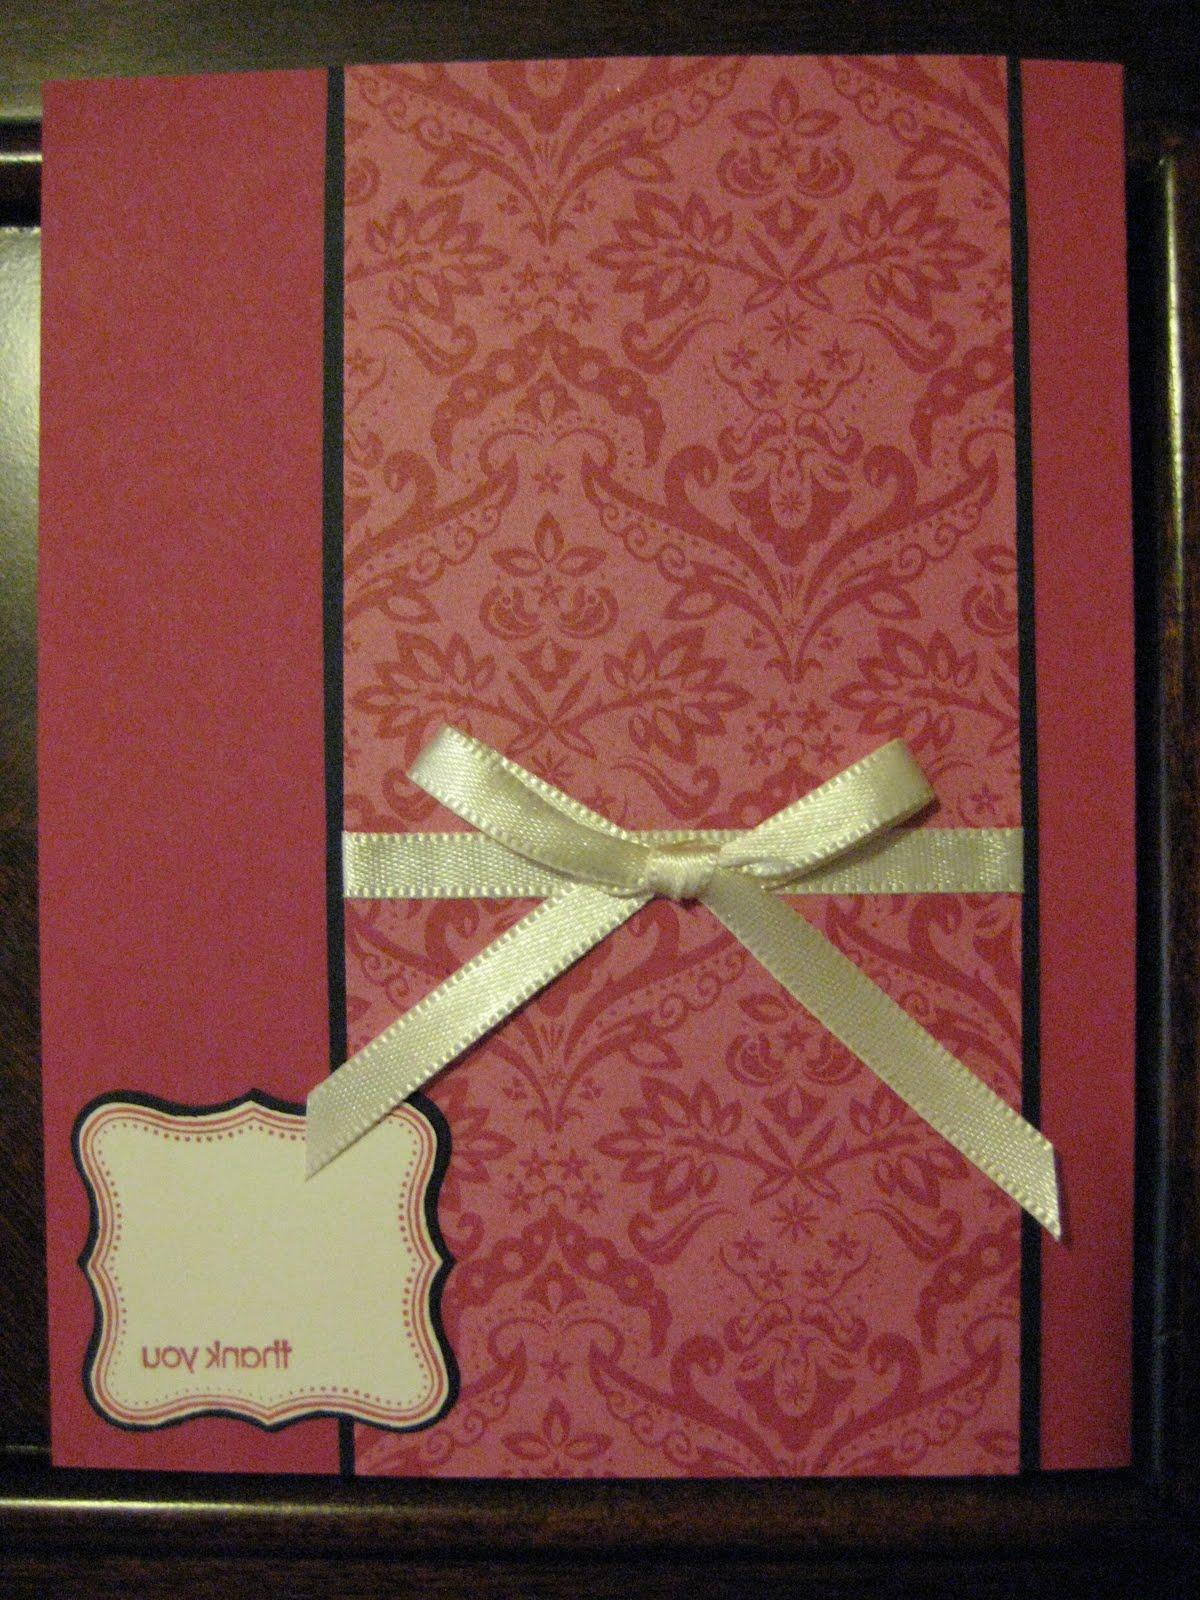 Blank wedding invitations kits